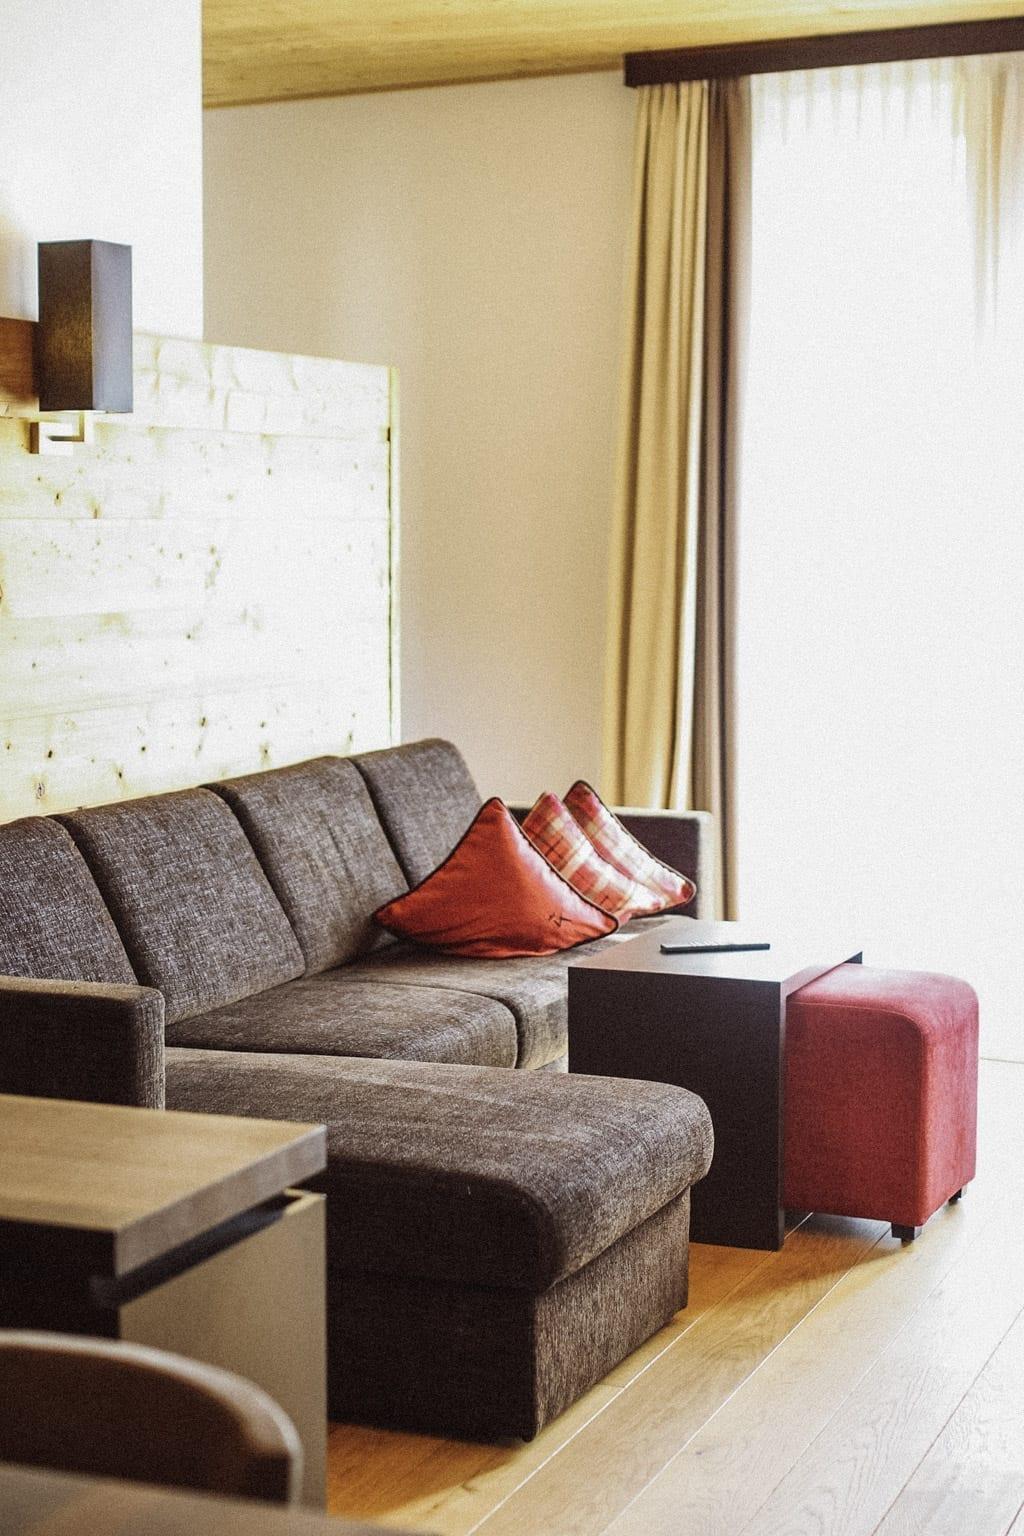 ck-constantlyk-com-karin-kaswurm-achensee-luis-trenker-hotel-kronthaler-tirol-0527